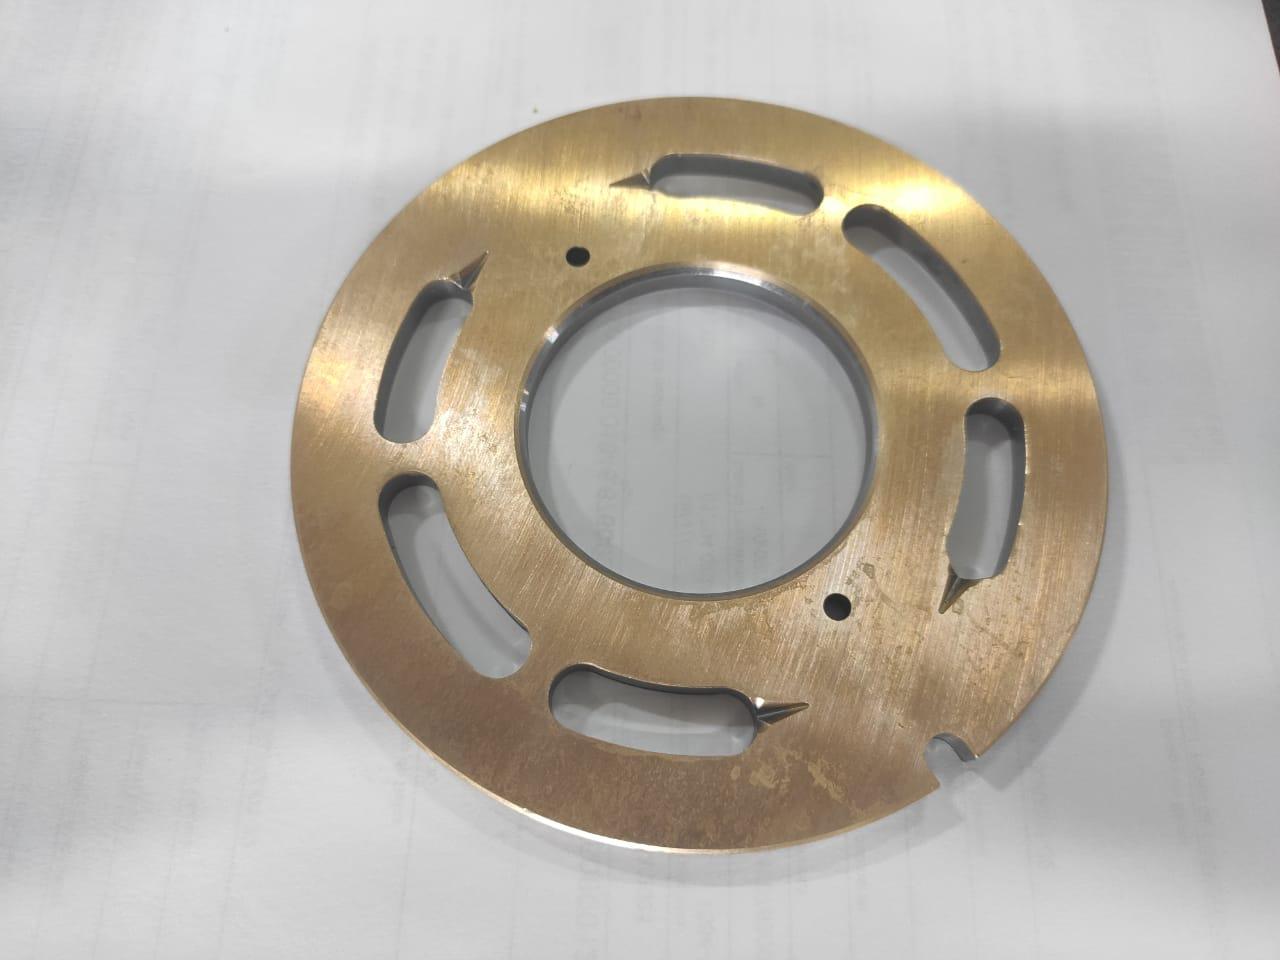 Placa válvula motor giro Komatsu PC160LC-7